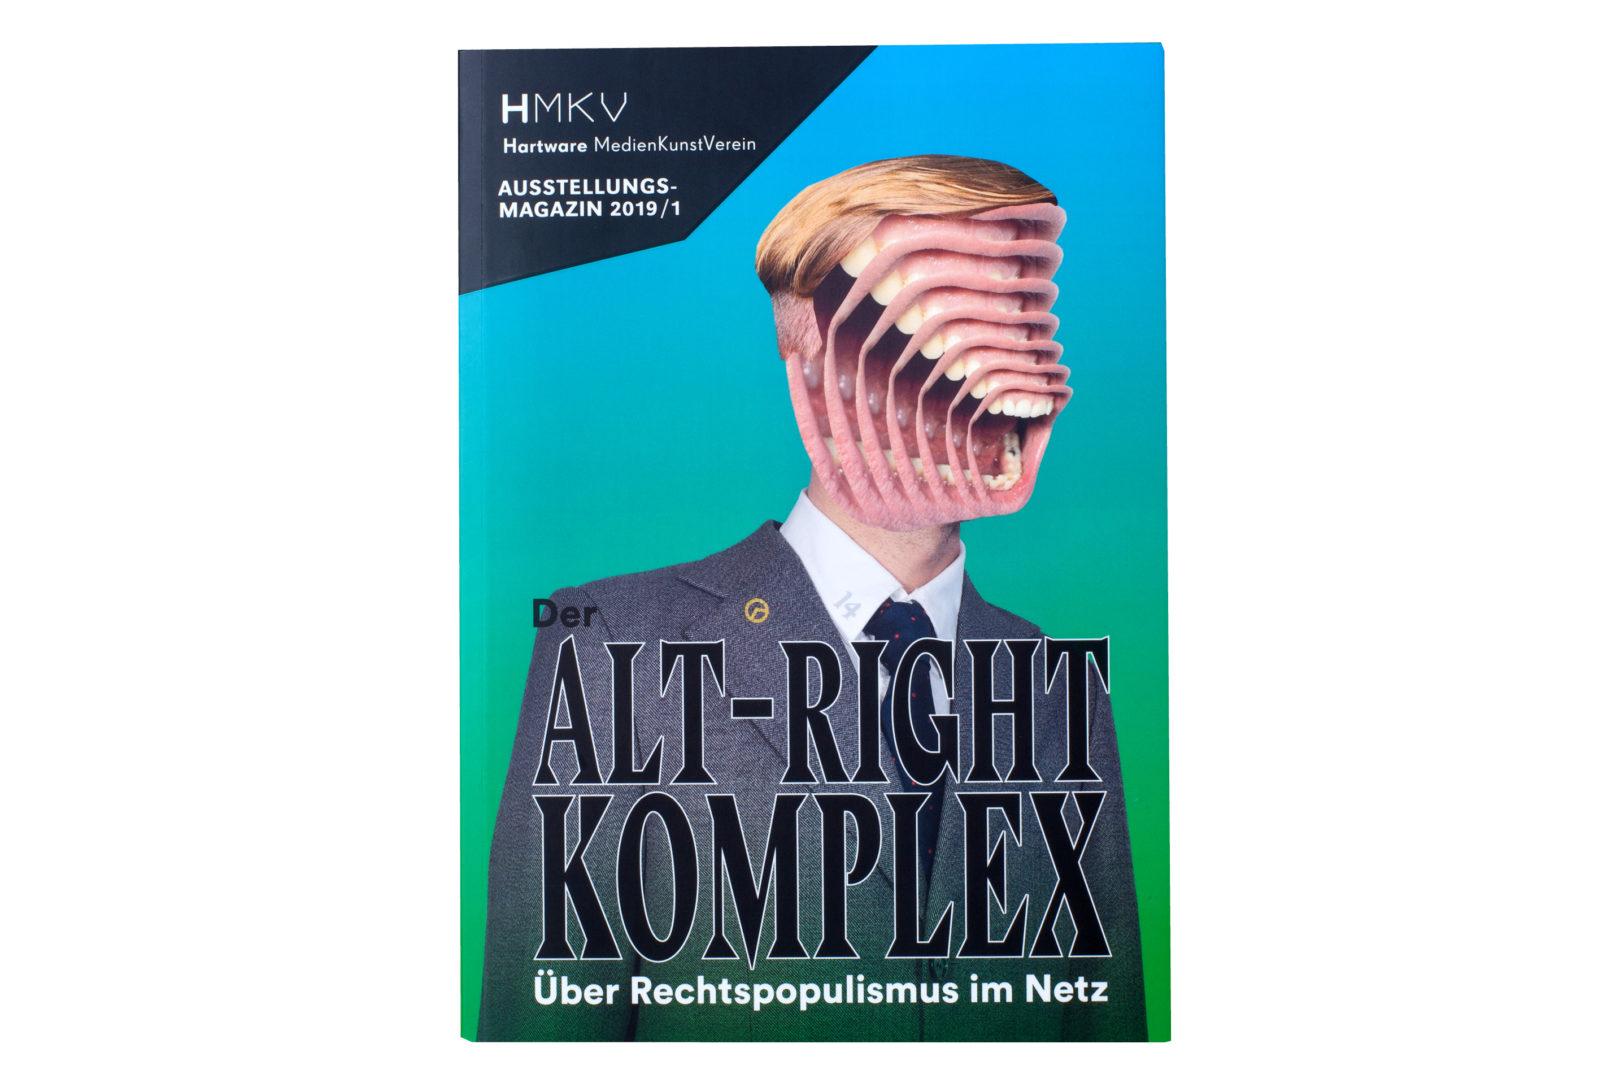 http://e-o-t.de/wordpress/wp-content/uploads/2019/04/eot-books-AltRight-1.jpg